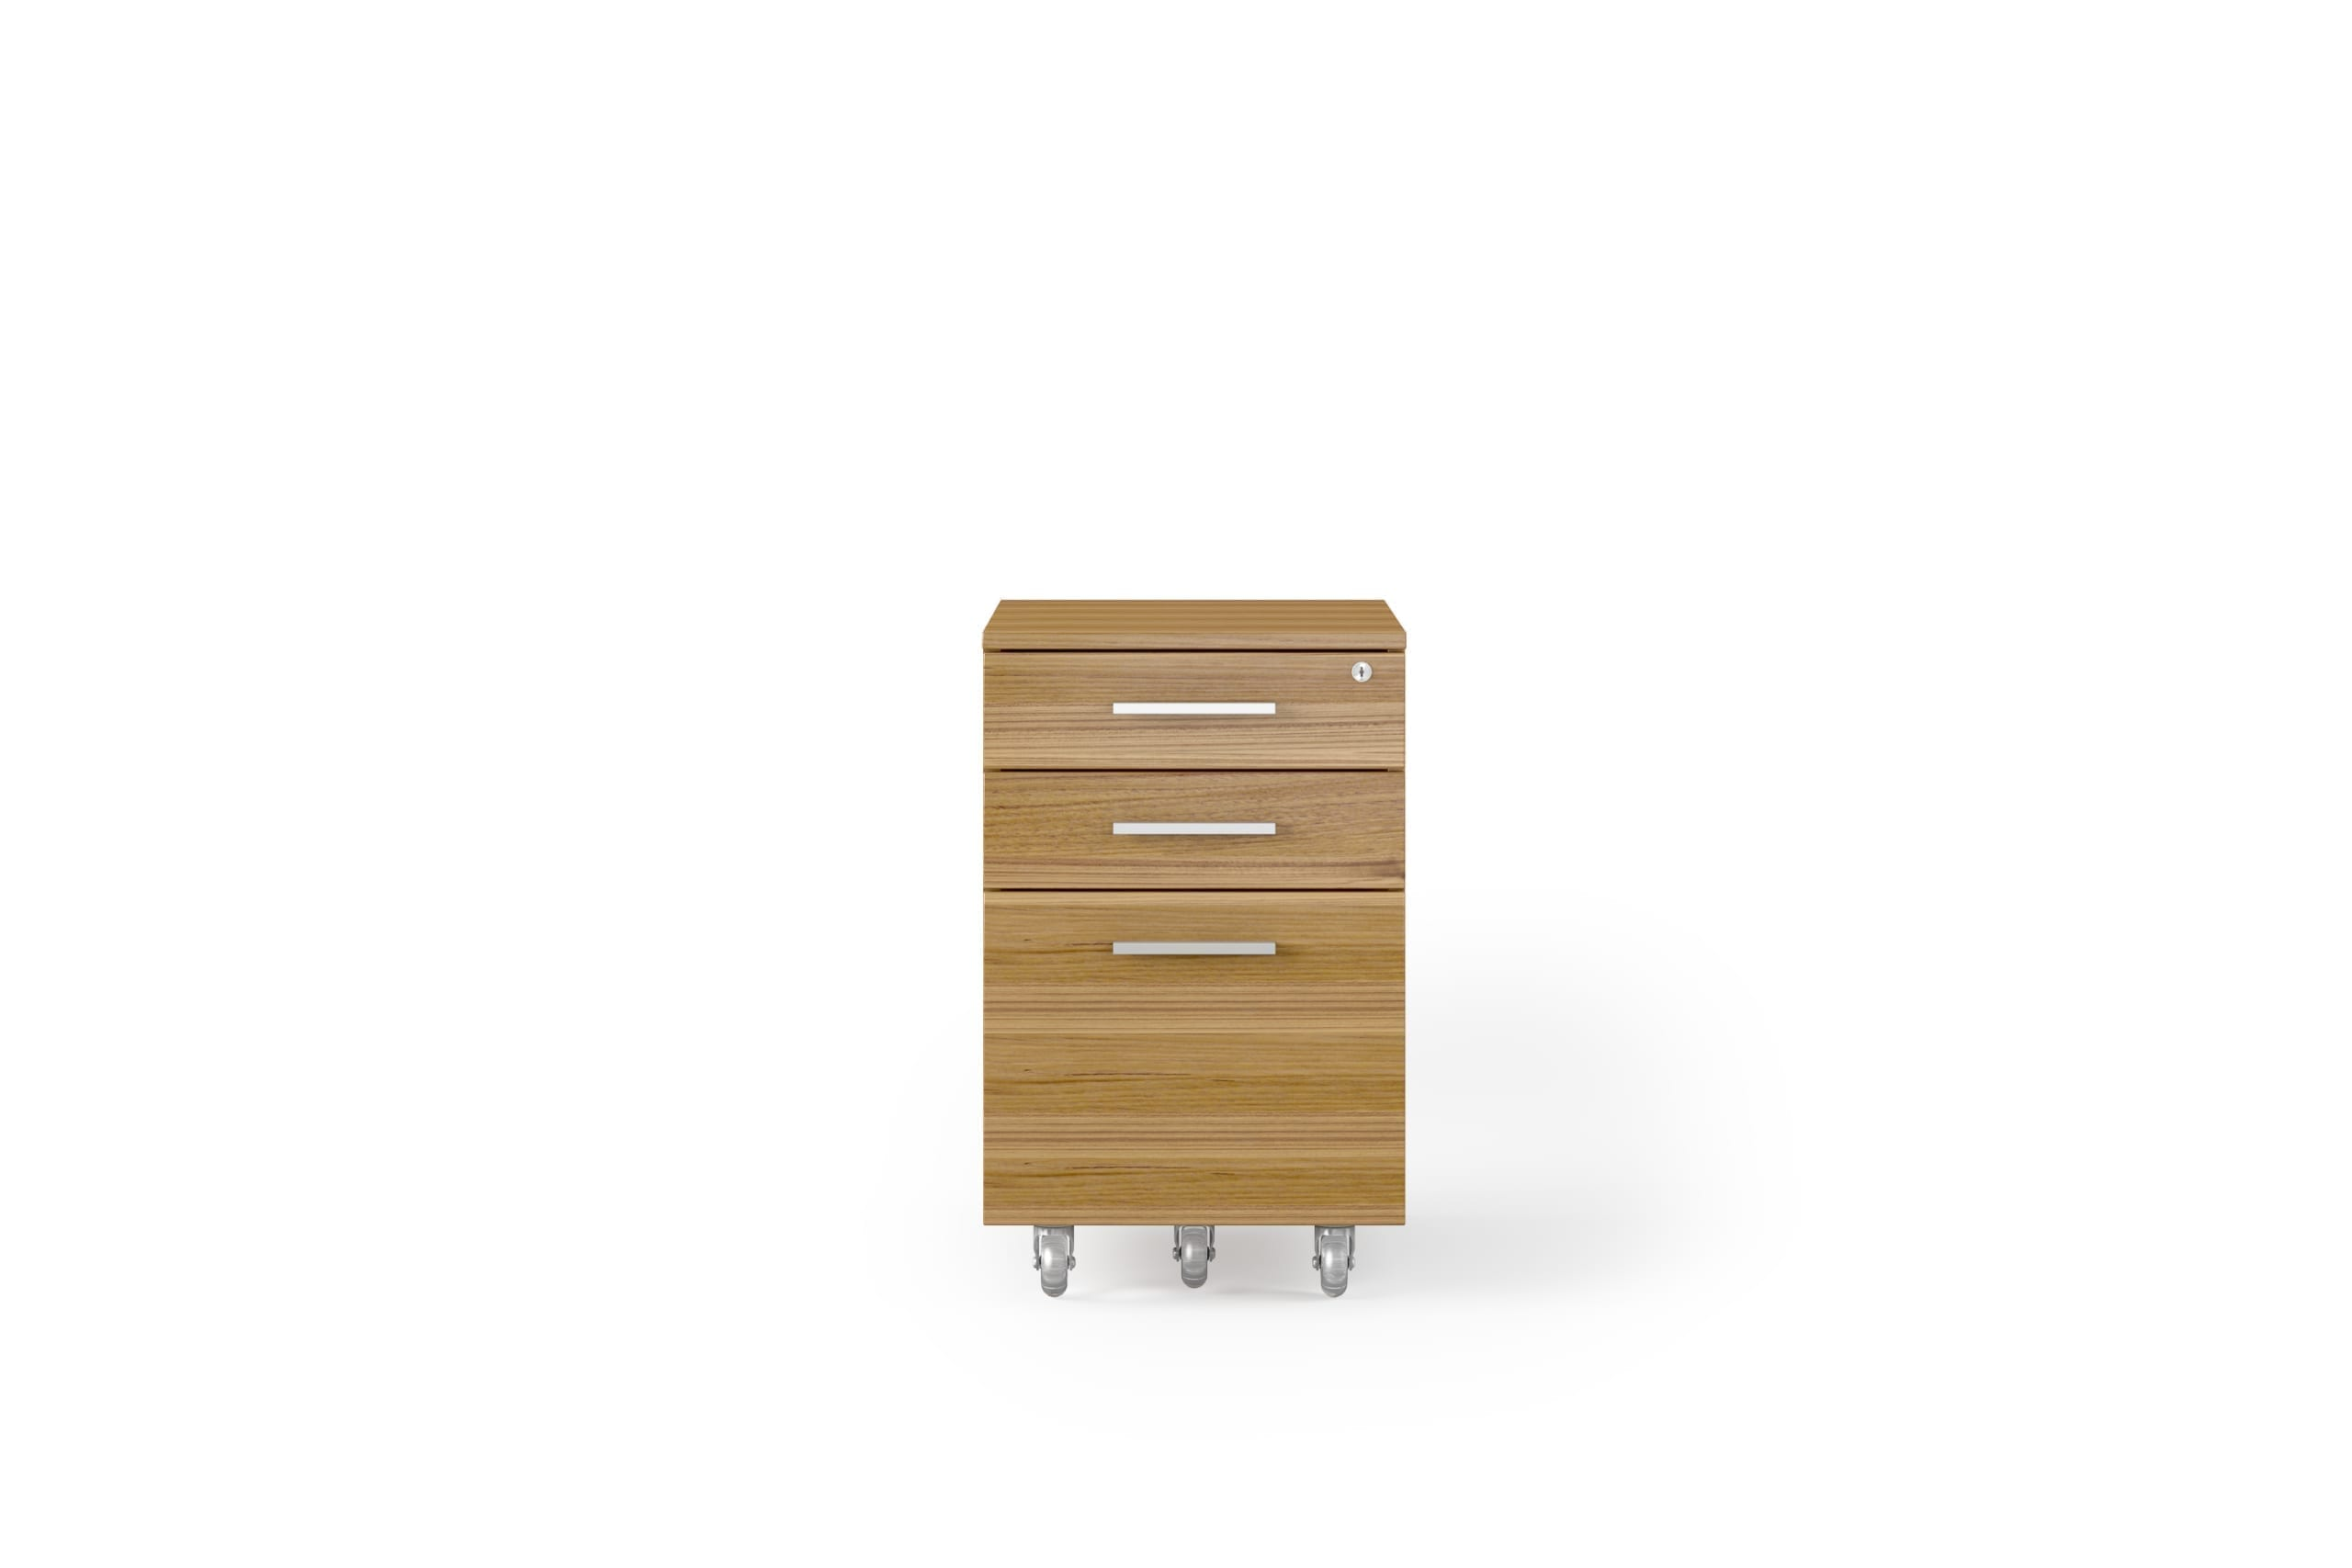 Sequel 6107 Low Mobile Storage & File Cabinet WL SN 1